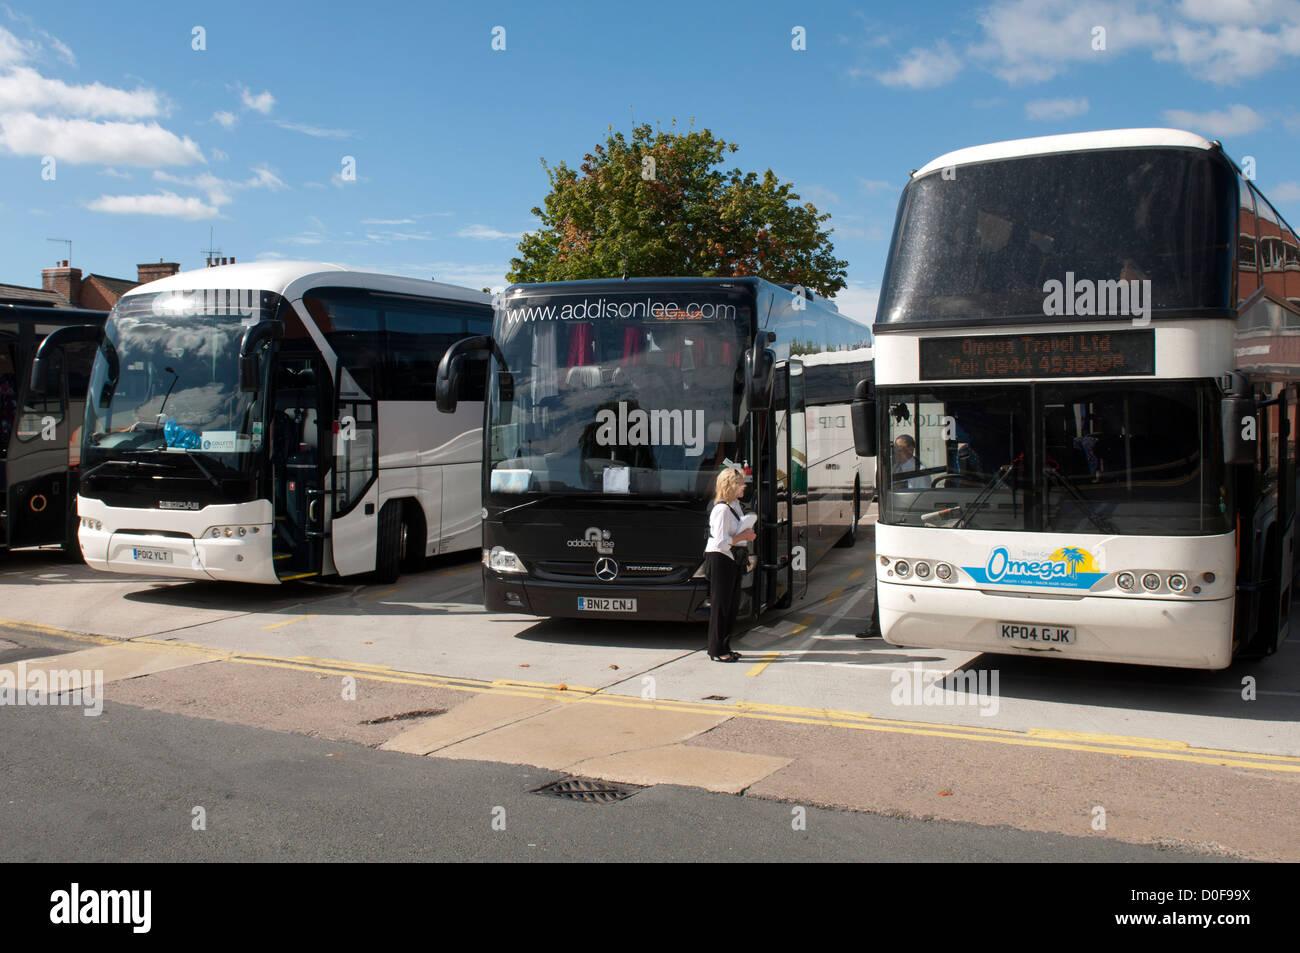 Windsor Street Coach Park Stratford Upon Avon UK